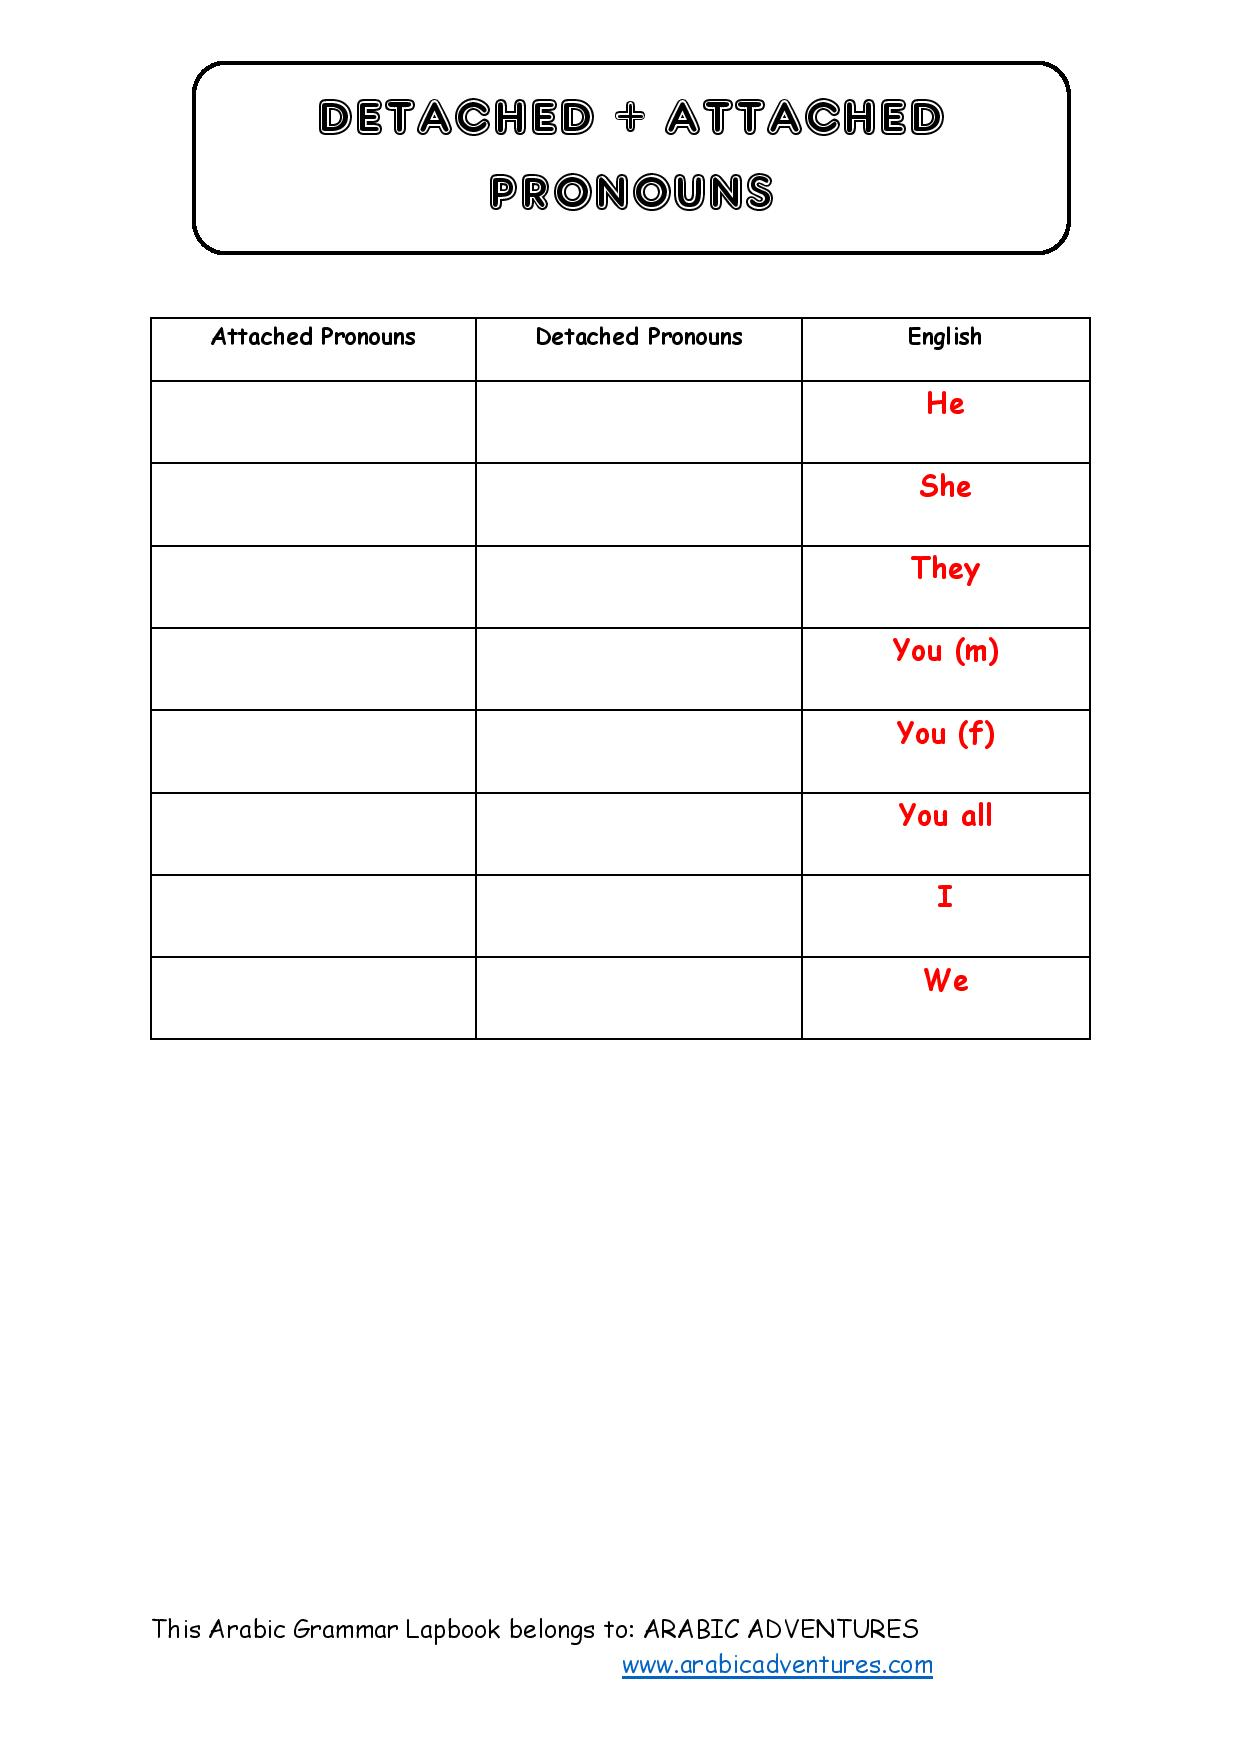 Arabic Grammar Lapbook Free Pack